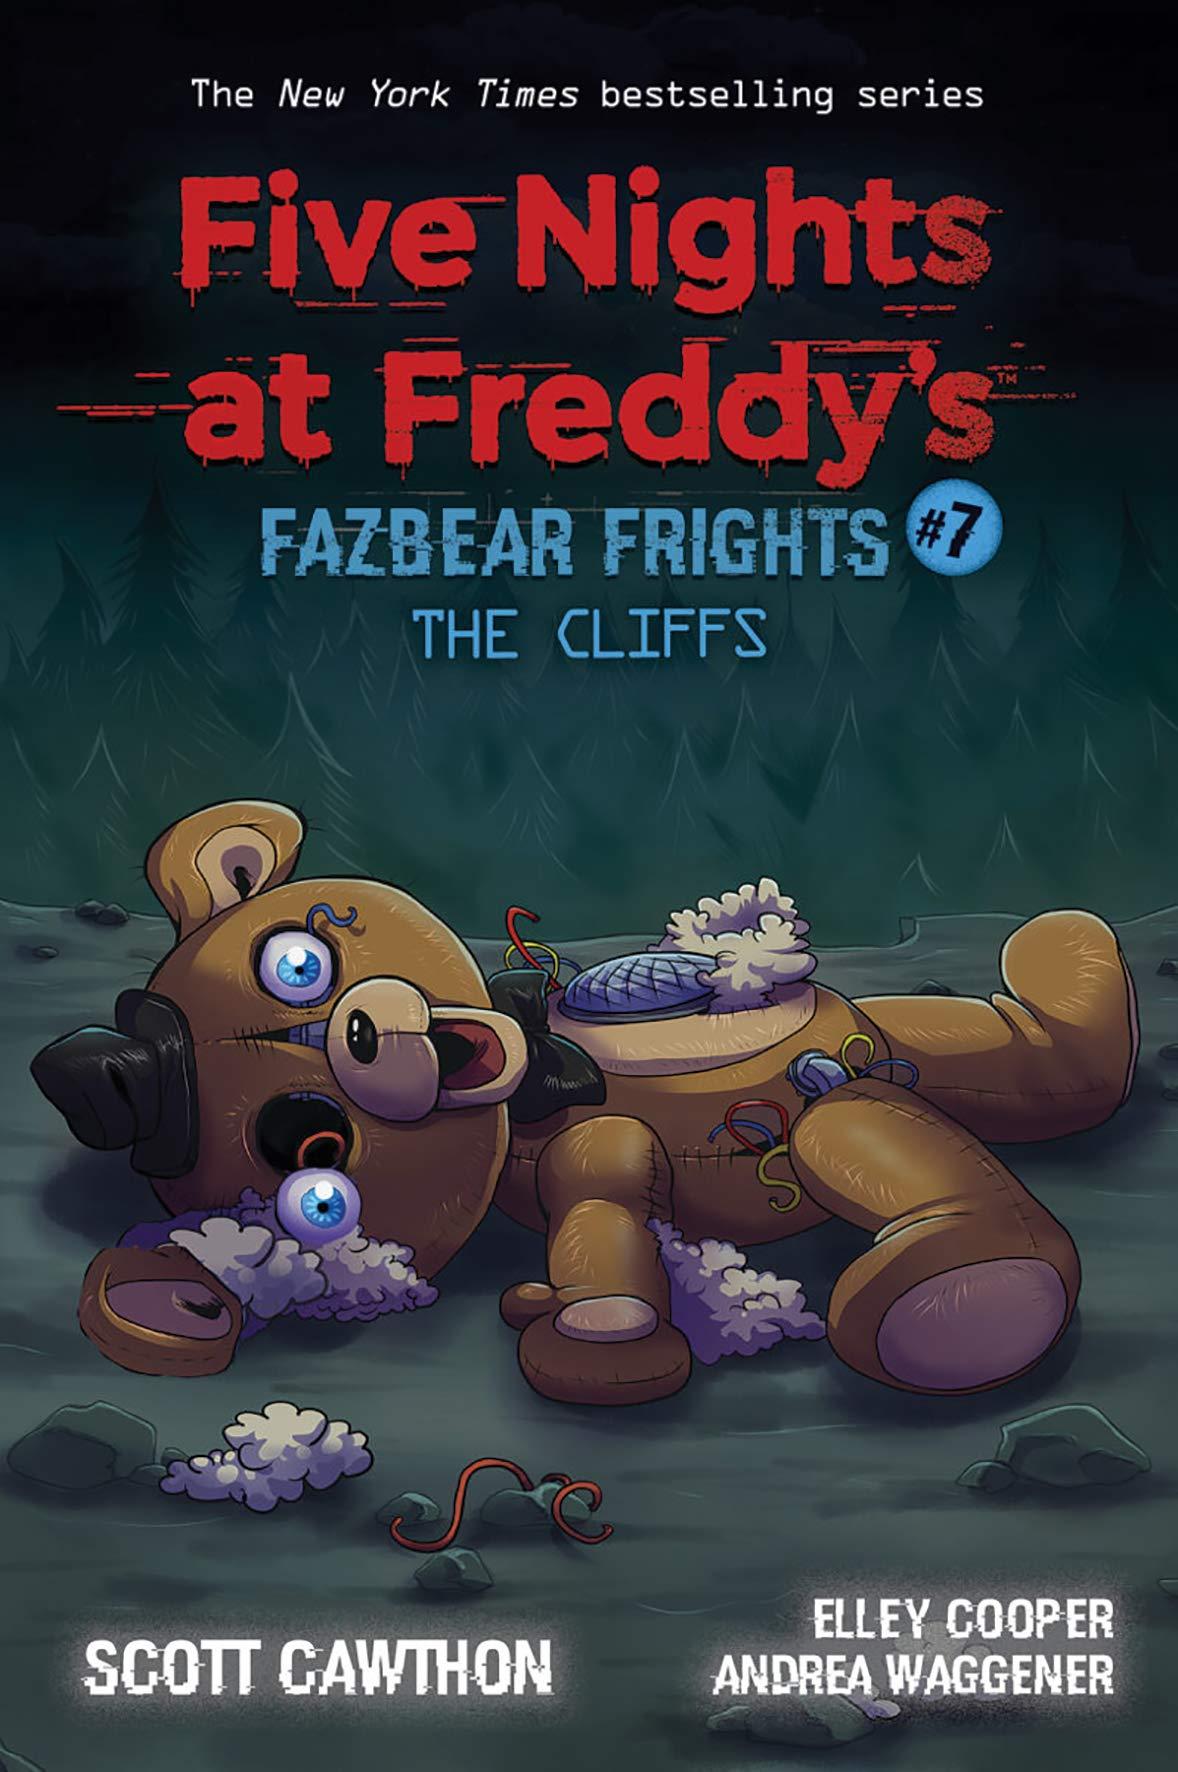 Amazon Com Five Nights At Freddy S Fazbear Frights 7 7 9781338703917 Cawthon Scott Books